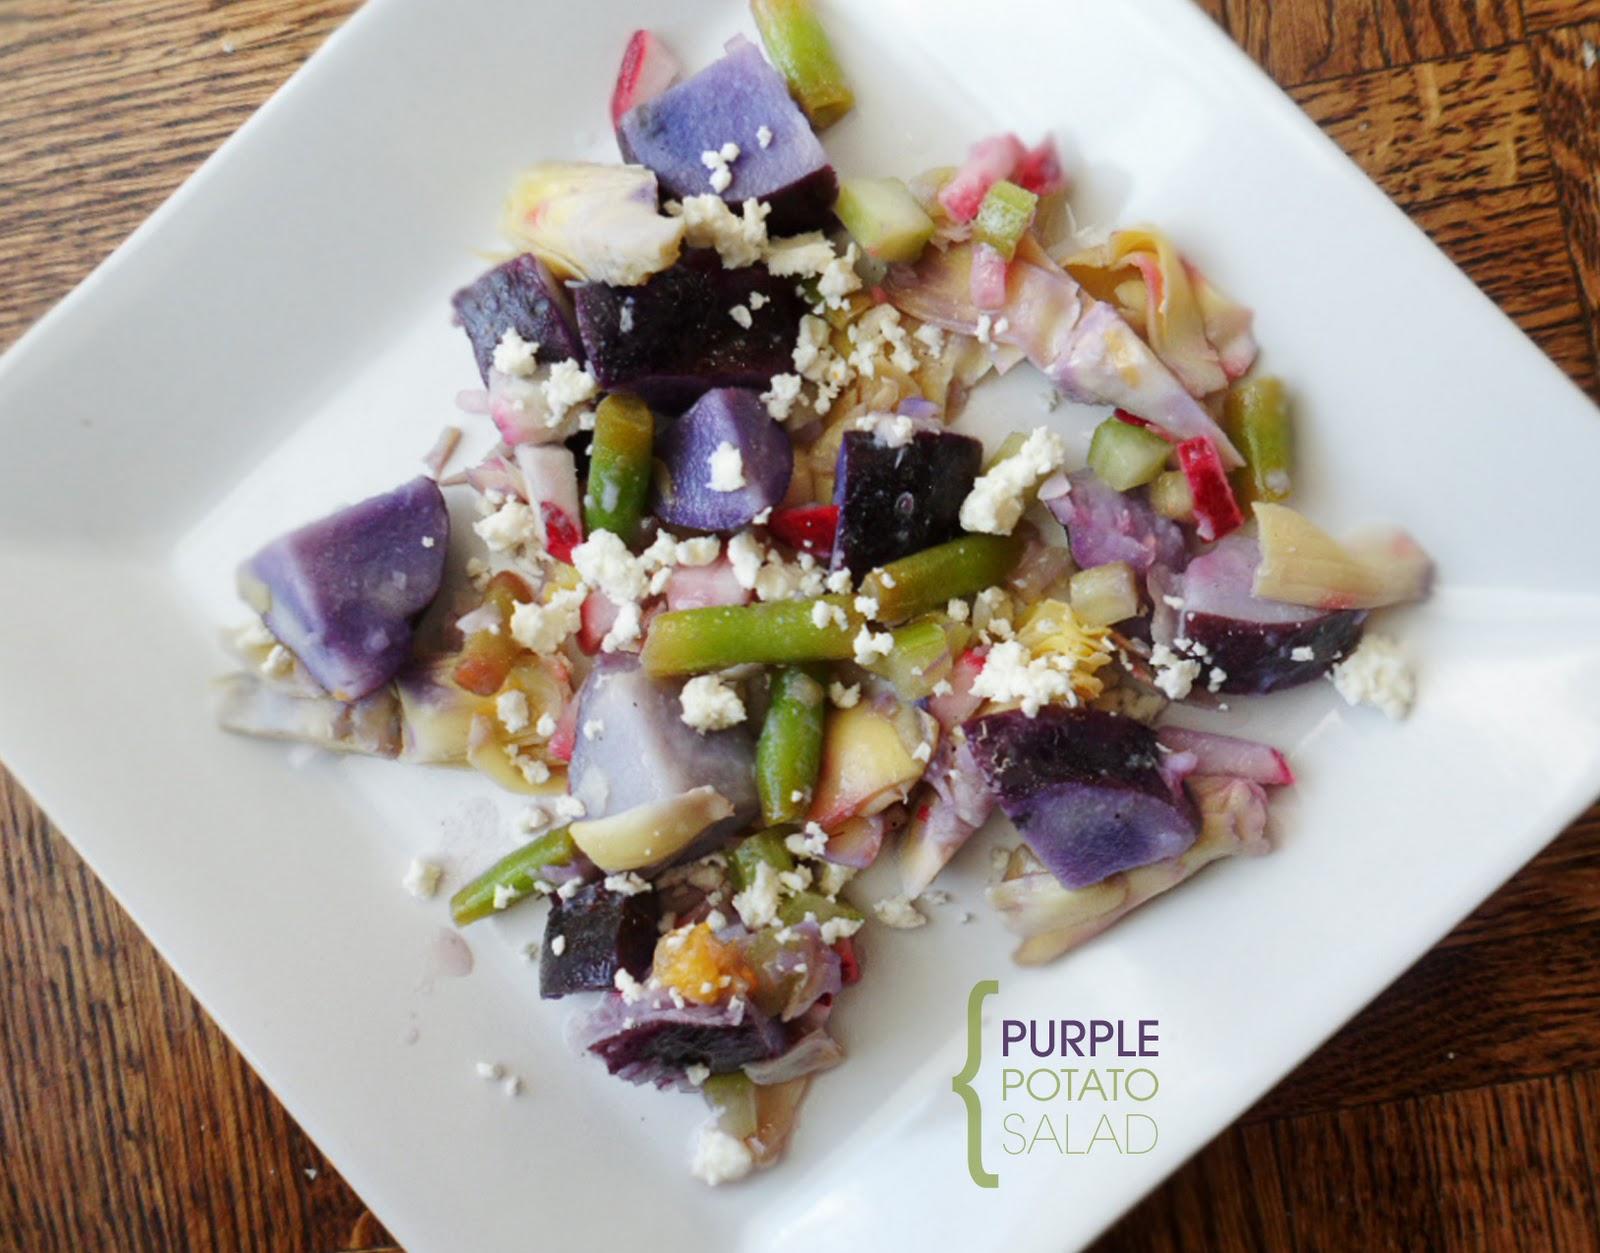 The Tomato Snob: Purple potato salad